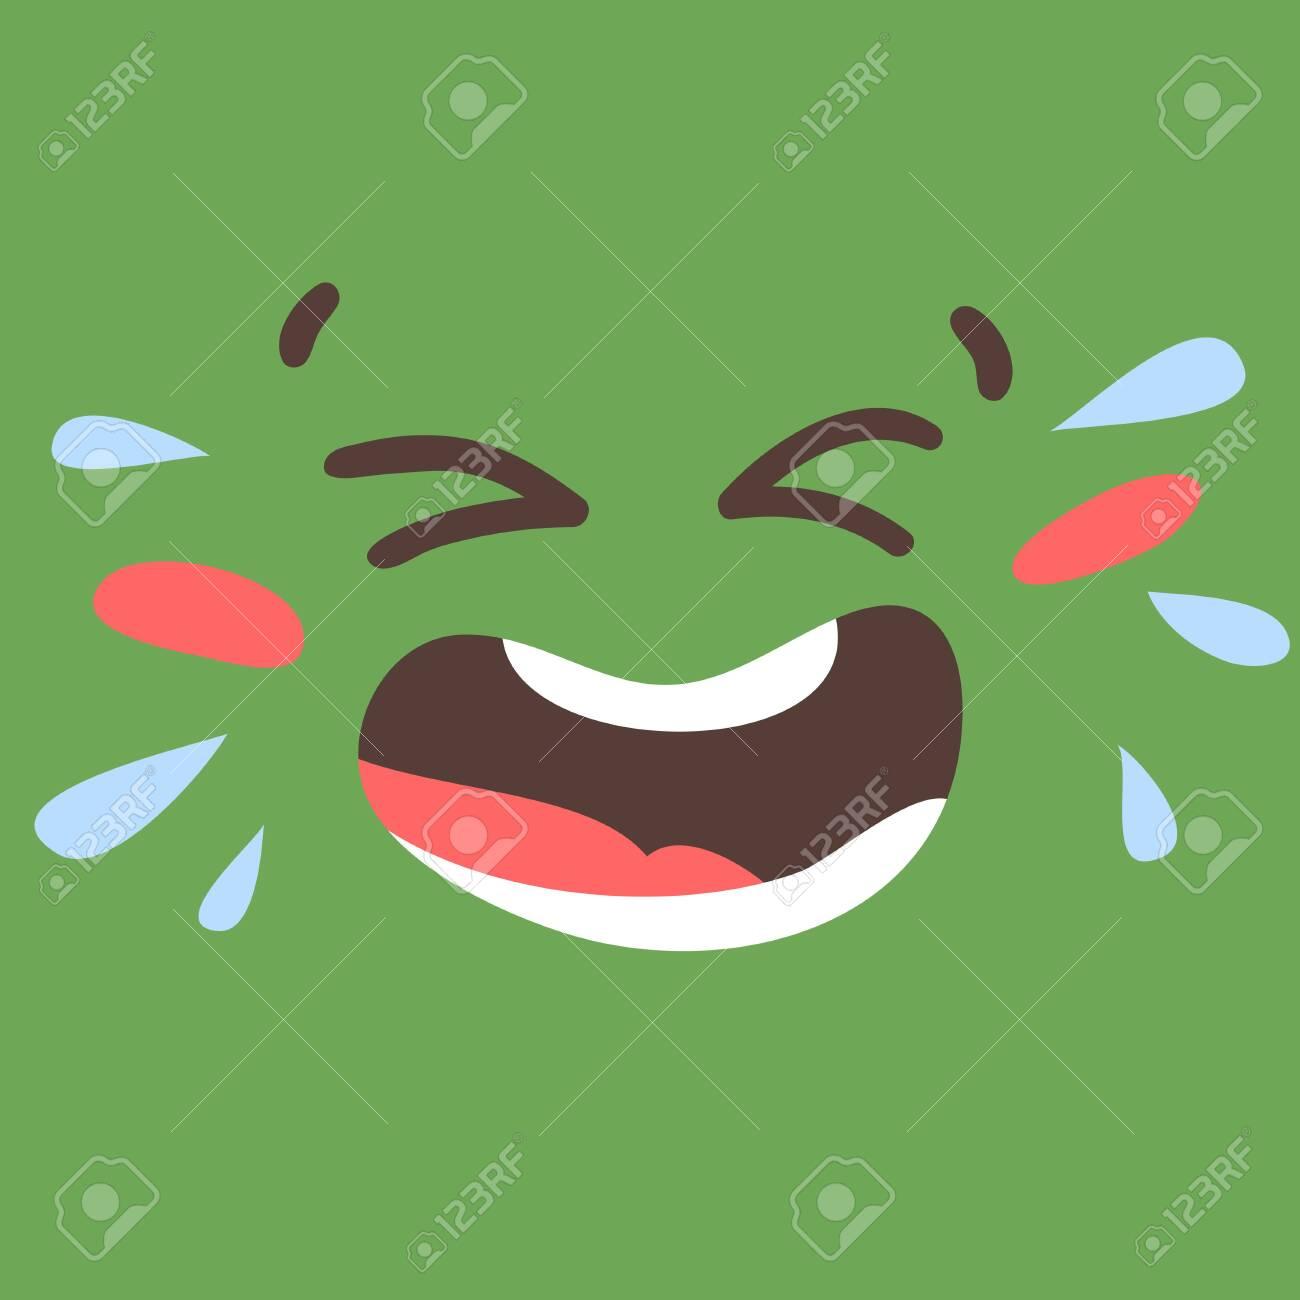 Cartoon drawing emoji. Hand drawn emotional face.Actual Vector illustration emoticon. Creative ink art work facial expression - 147359575